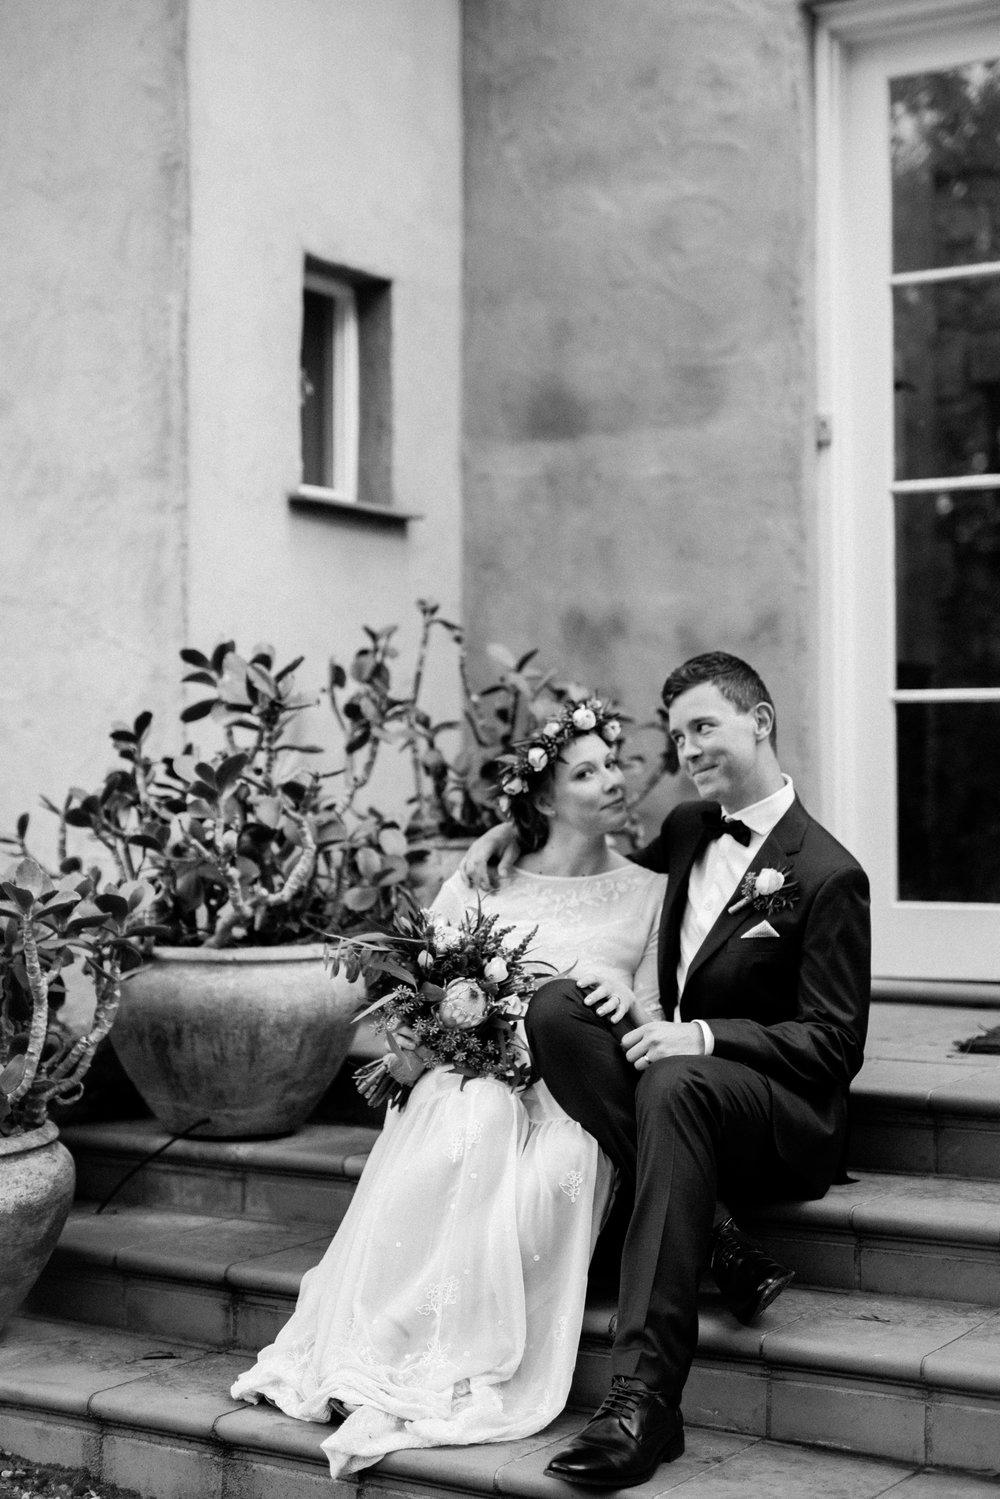 Jo & Aaron - Natural Wedding Photography in Adelaide - Beautiful, modern wedding photographer - Al Ru Farm Wedding Photography - Katherine Schultz_0034.jpg